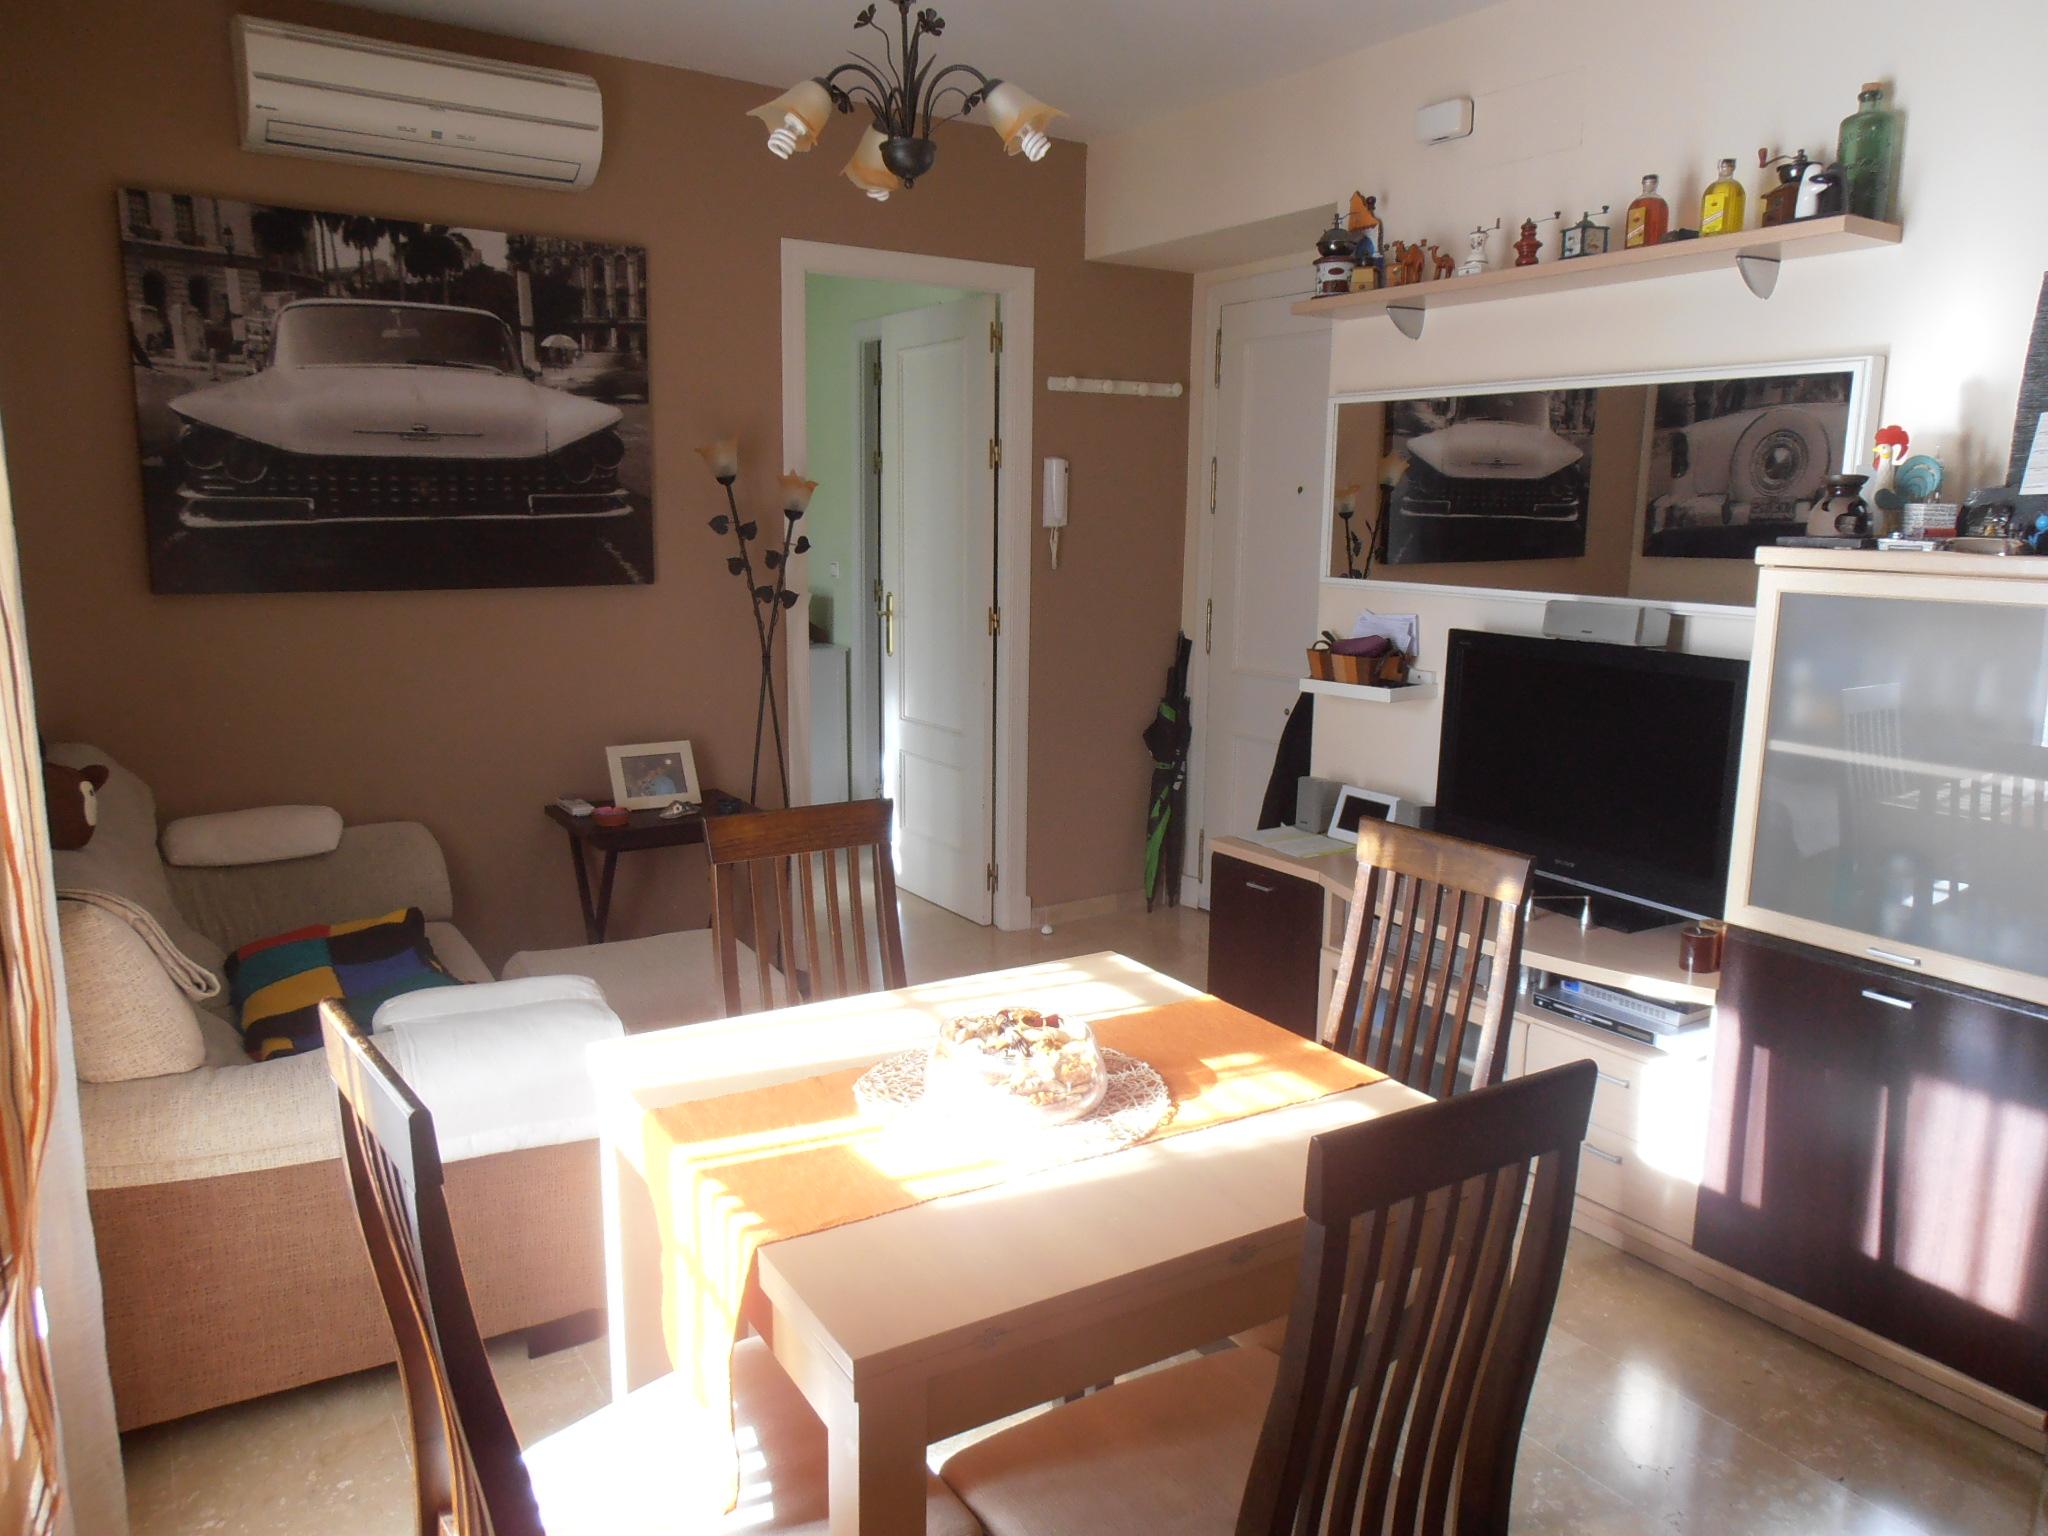 Se vende o alquila apartamento en pleno centro de Jerez